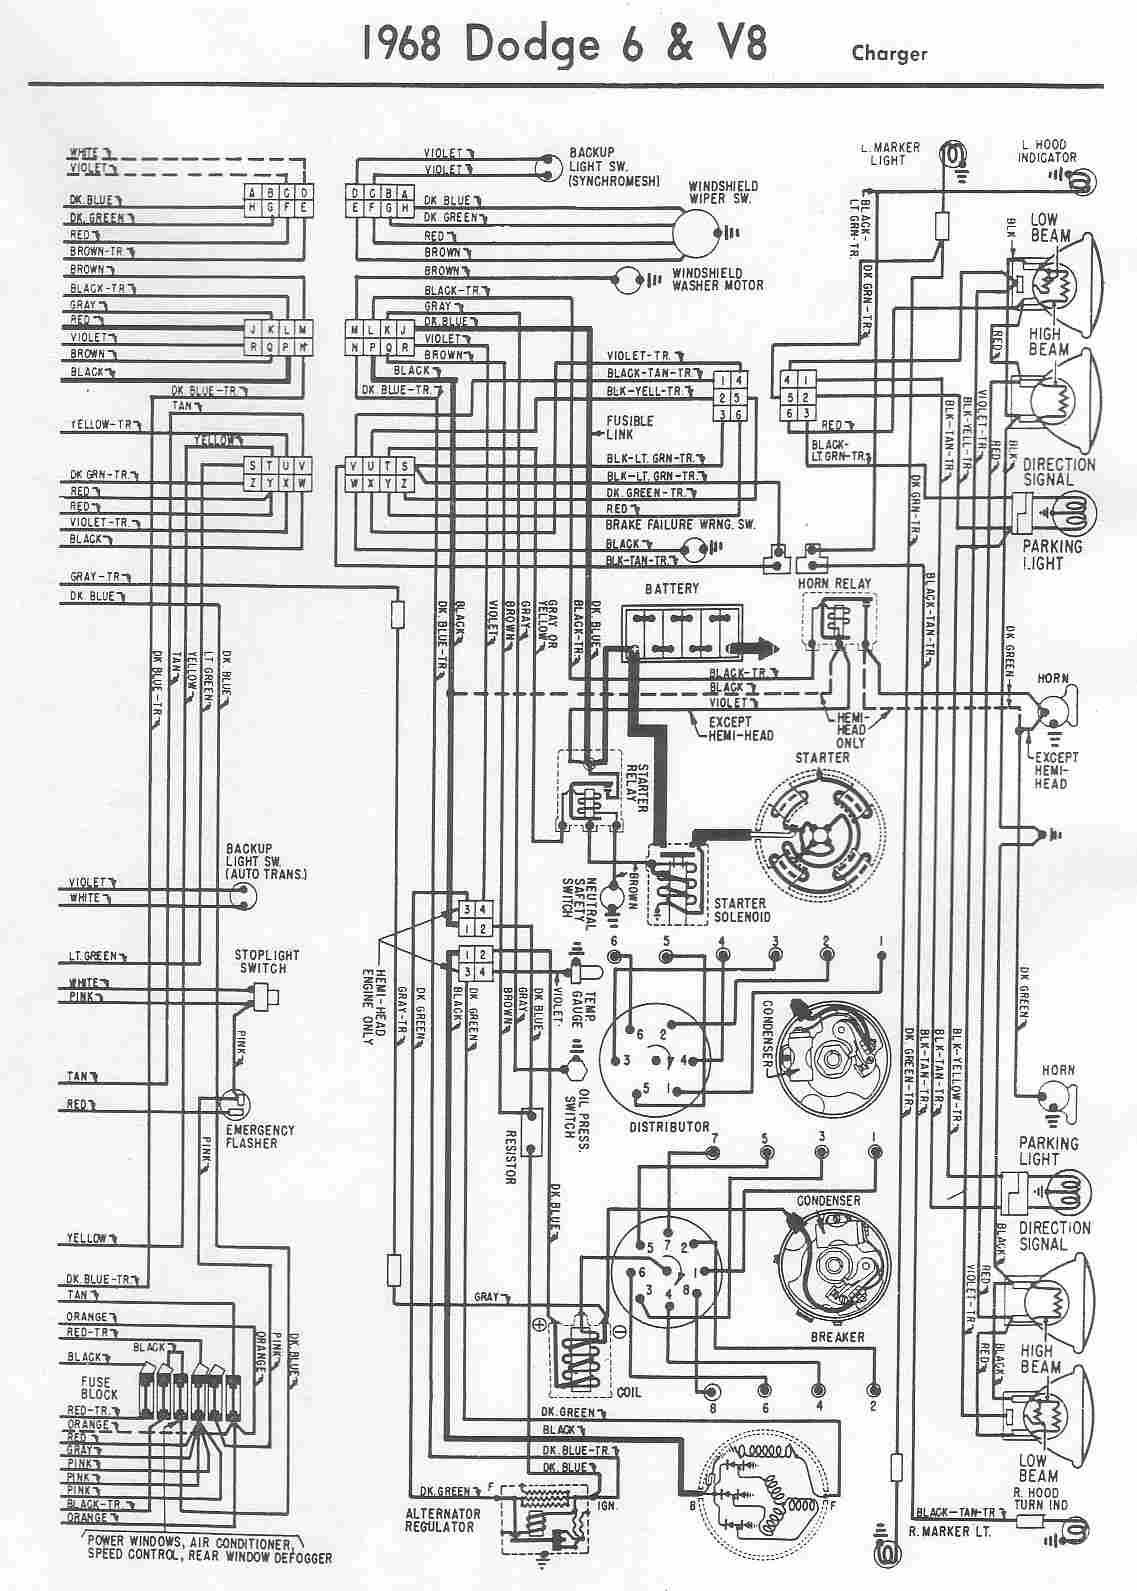 1969 ford galaxie 500 wiring diagram improve wiring diagram u2022 1966 ford mustang wiring diagram 1967  [ 1137 x 1591 Pixel ]